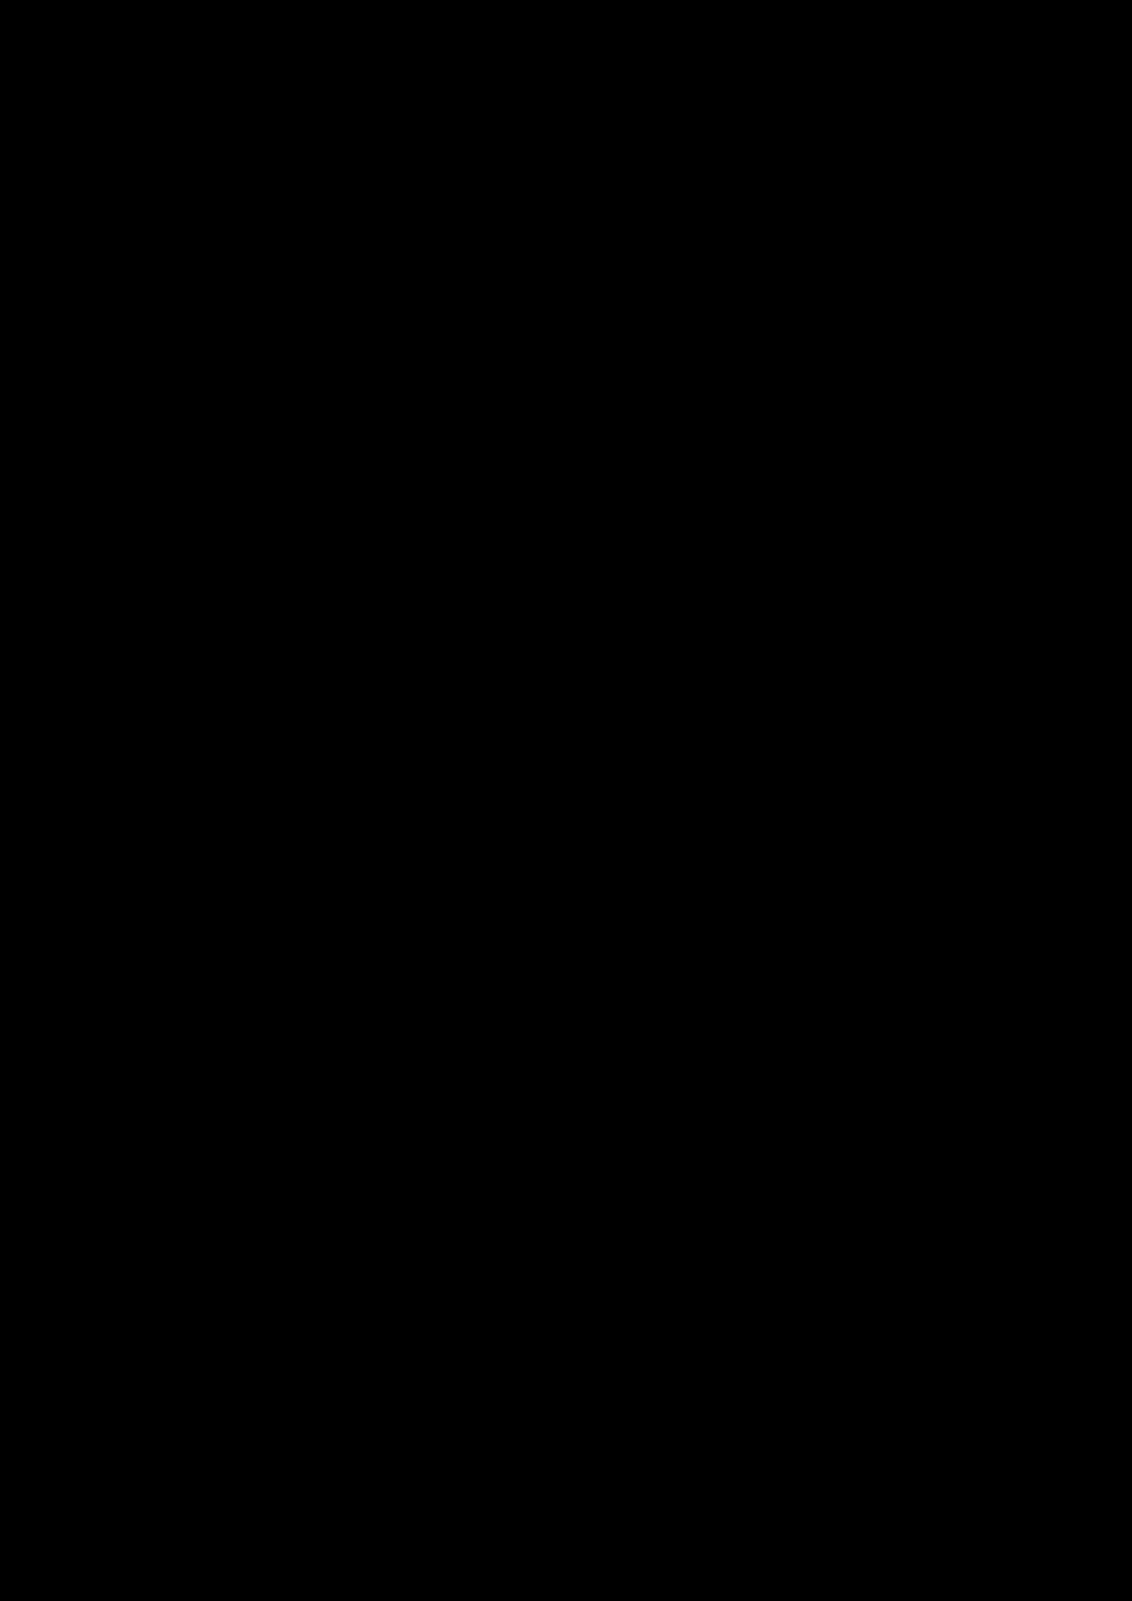 Belyiy sokol slide, Image 114